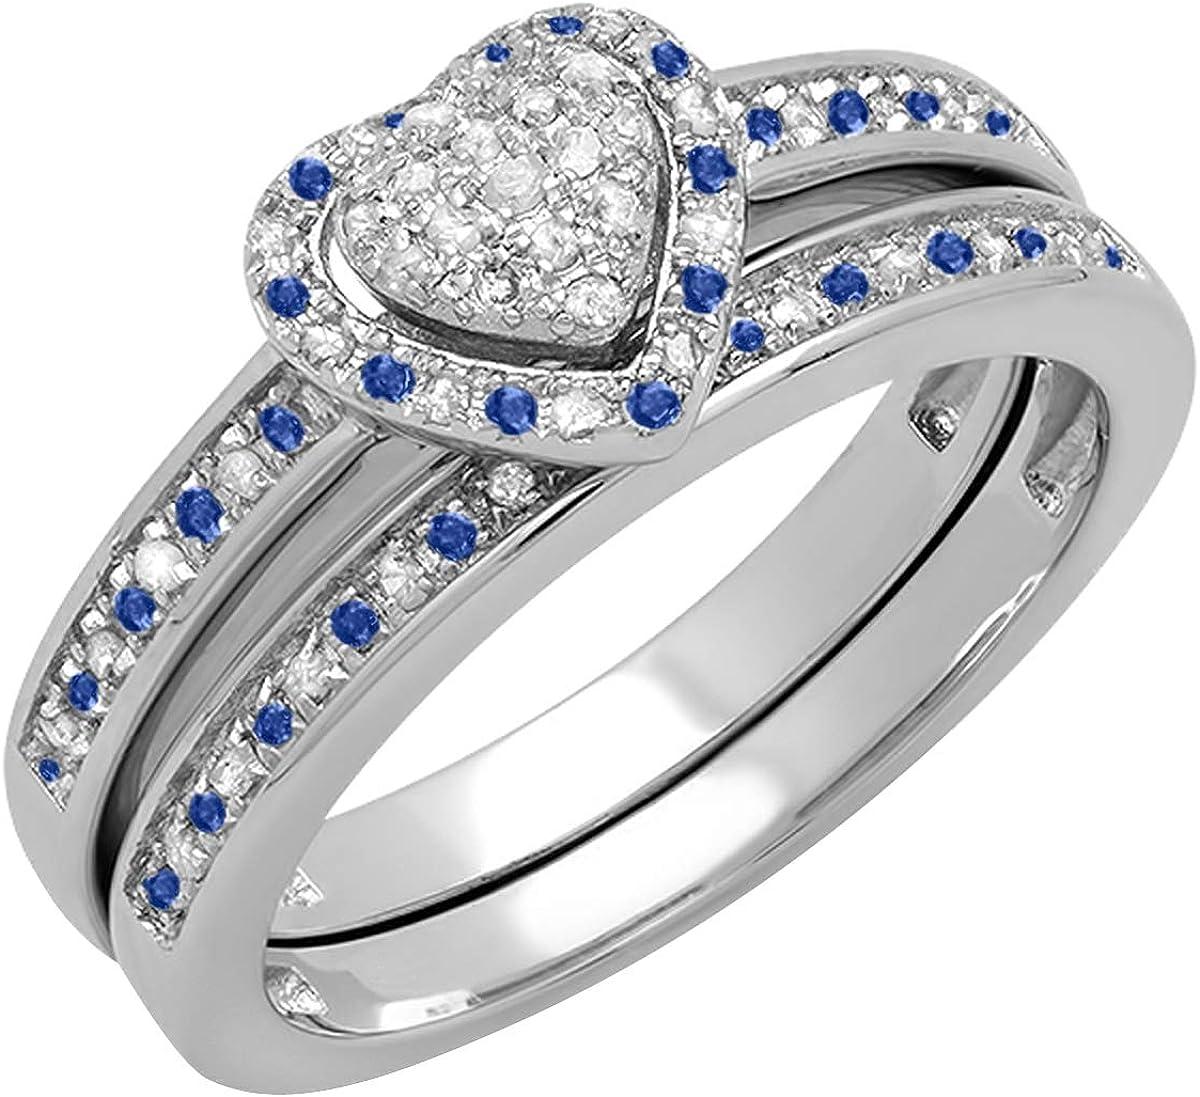 Dazzlingrock Collection Max 85% OFF Round favorite Blue Ladi Diamond Sapphire White